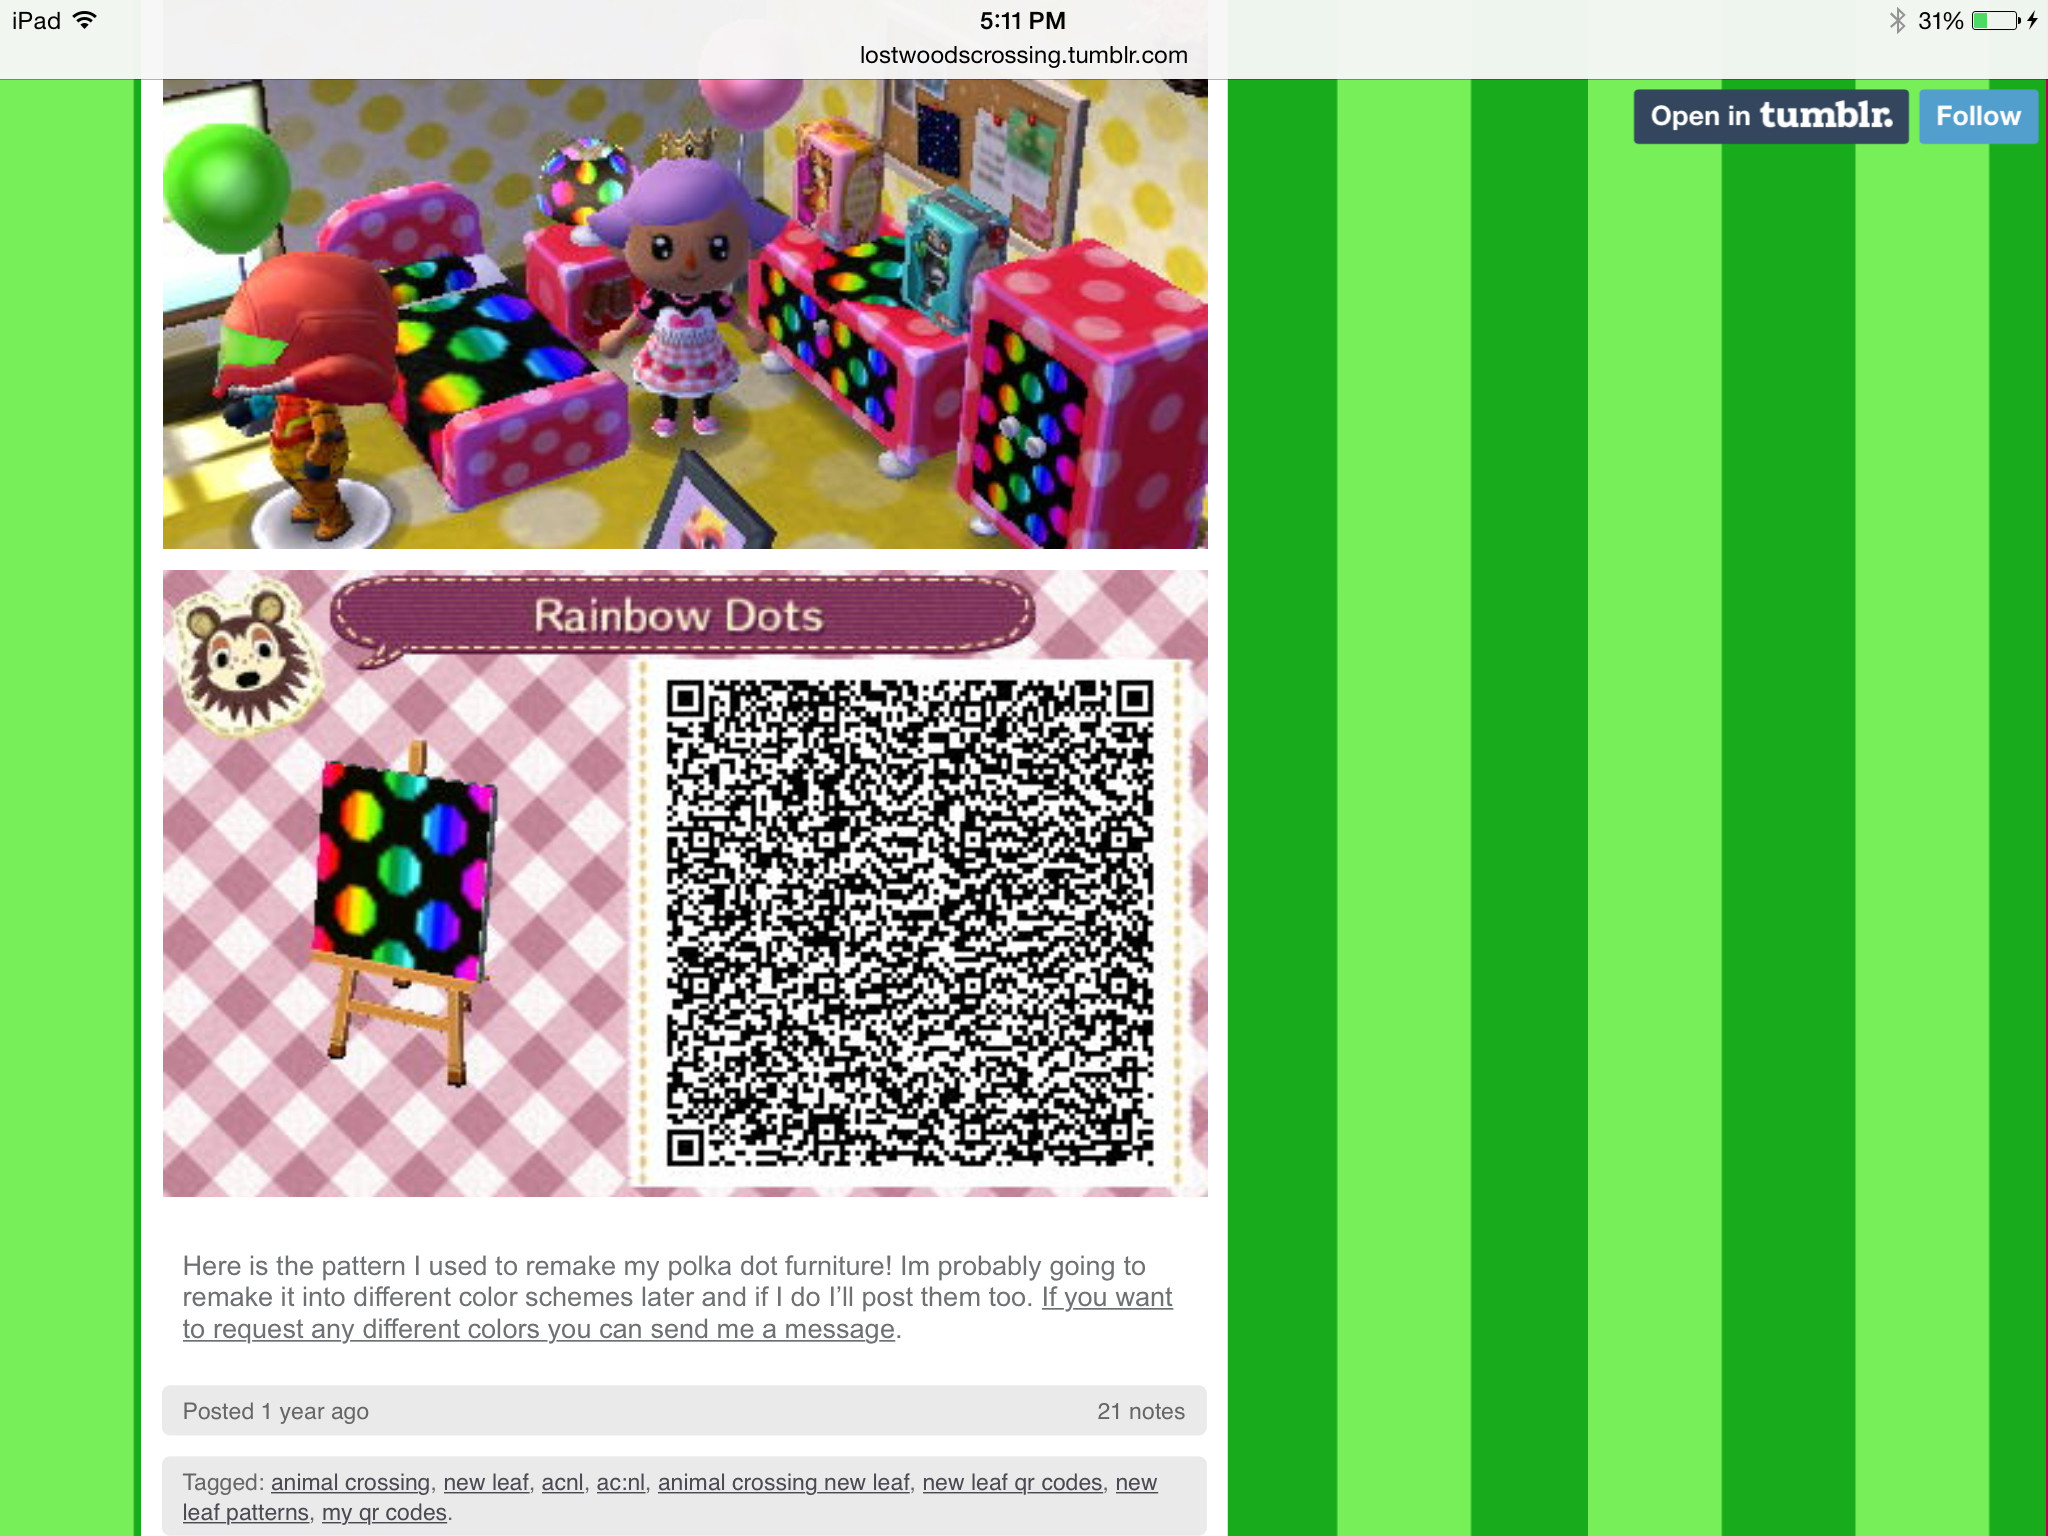 Animal Crossing Qr Codes Wallpaper Acnl Wallpaper Qr Codes 52dazhew